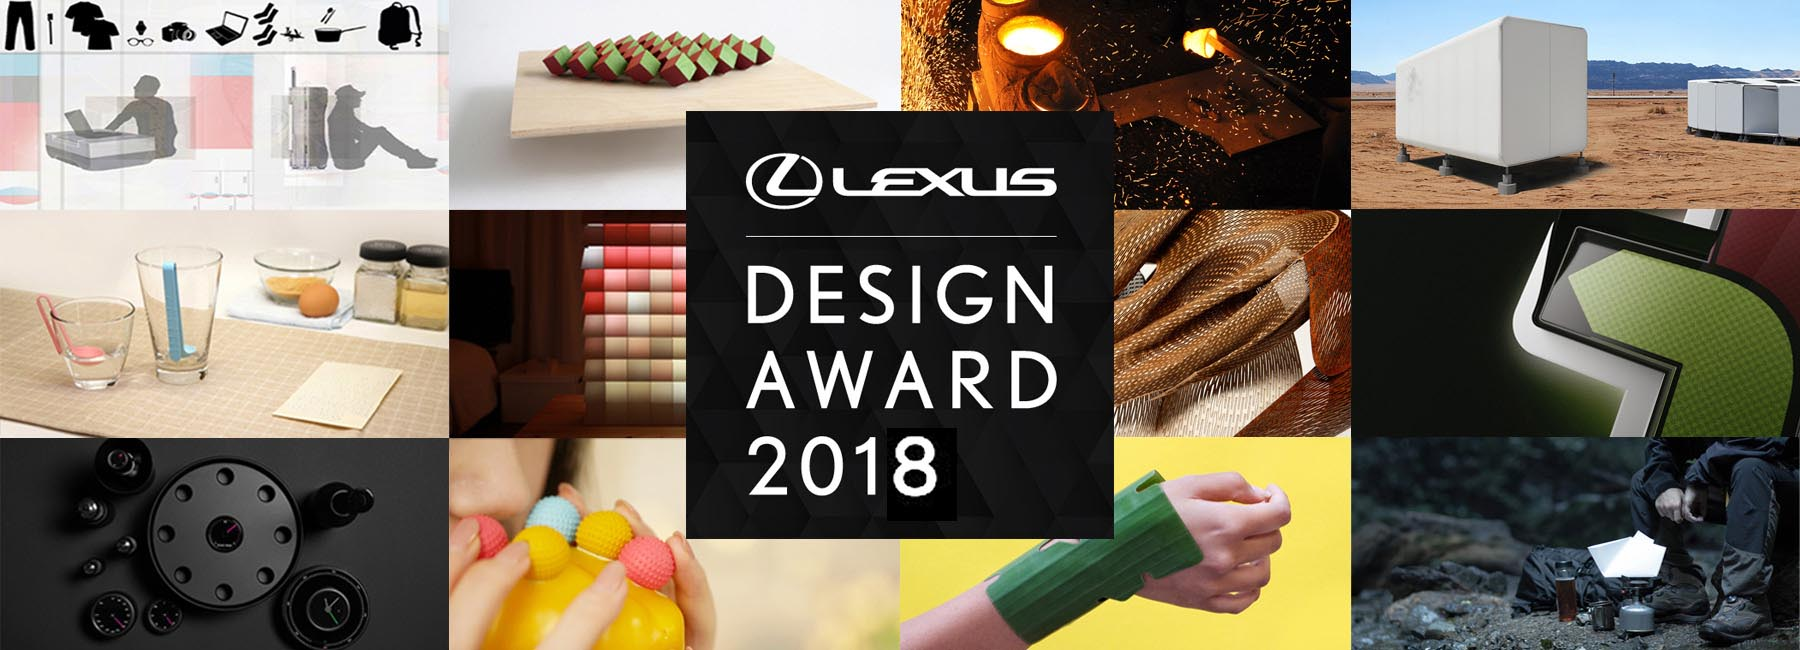 Lexus Design Award 2018 Economia De Hoy